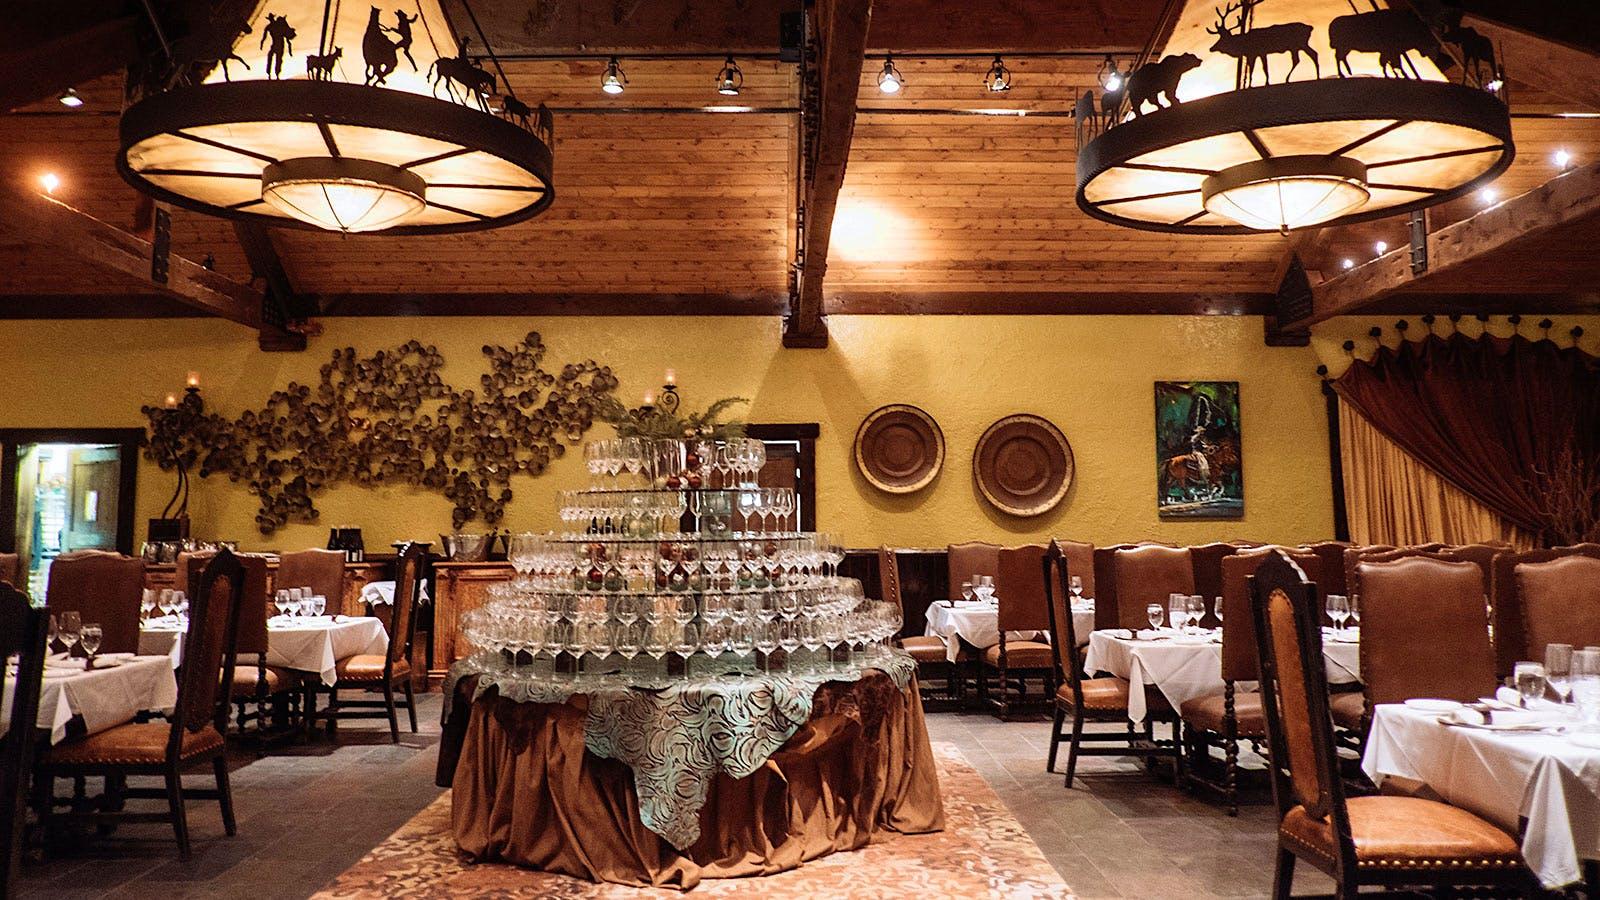 Restaurant Spotlight: Pomp